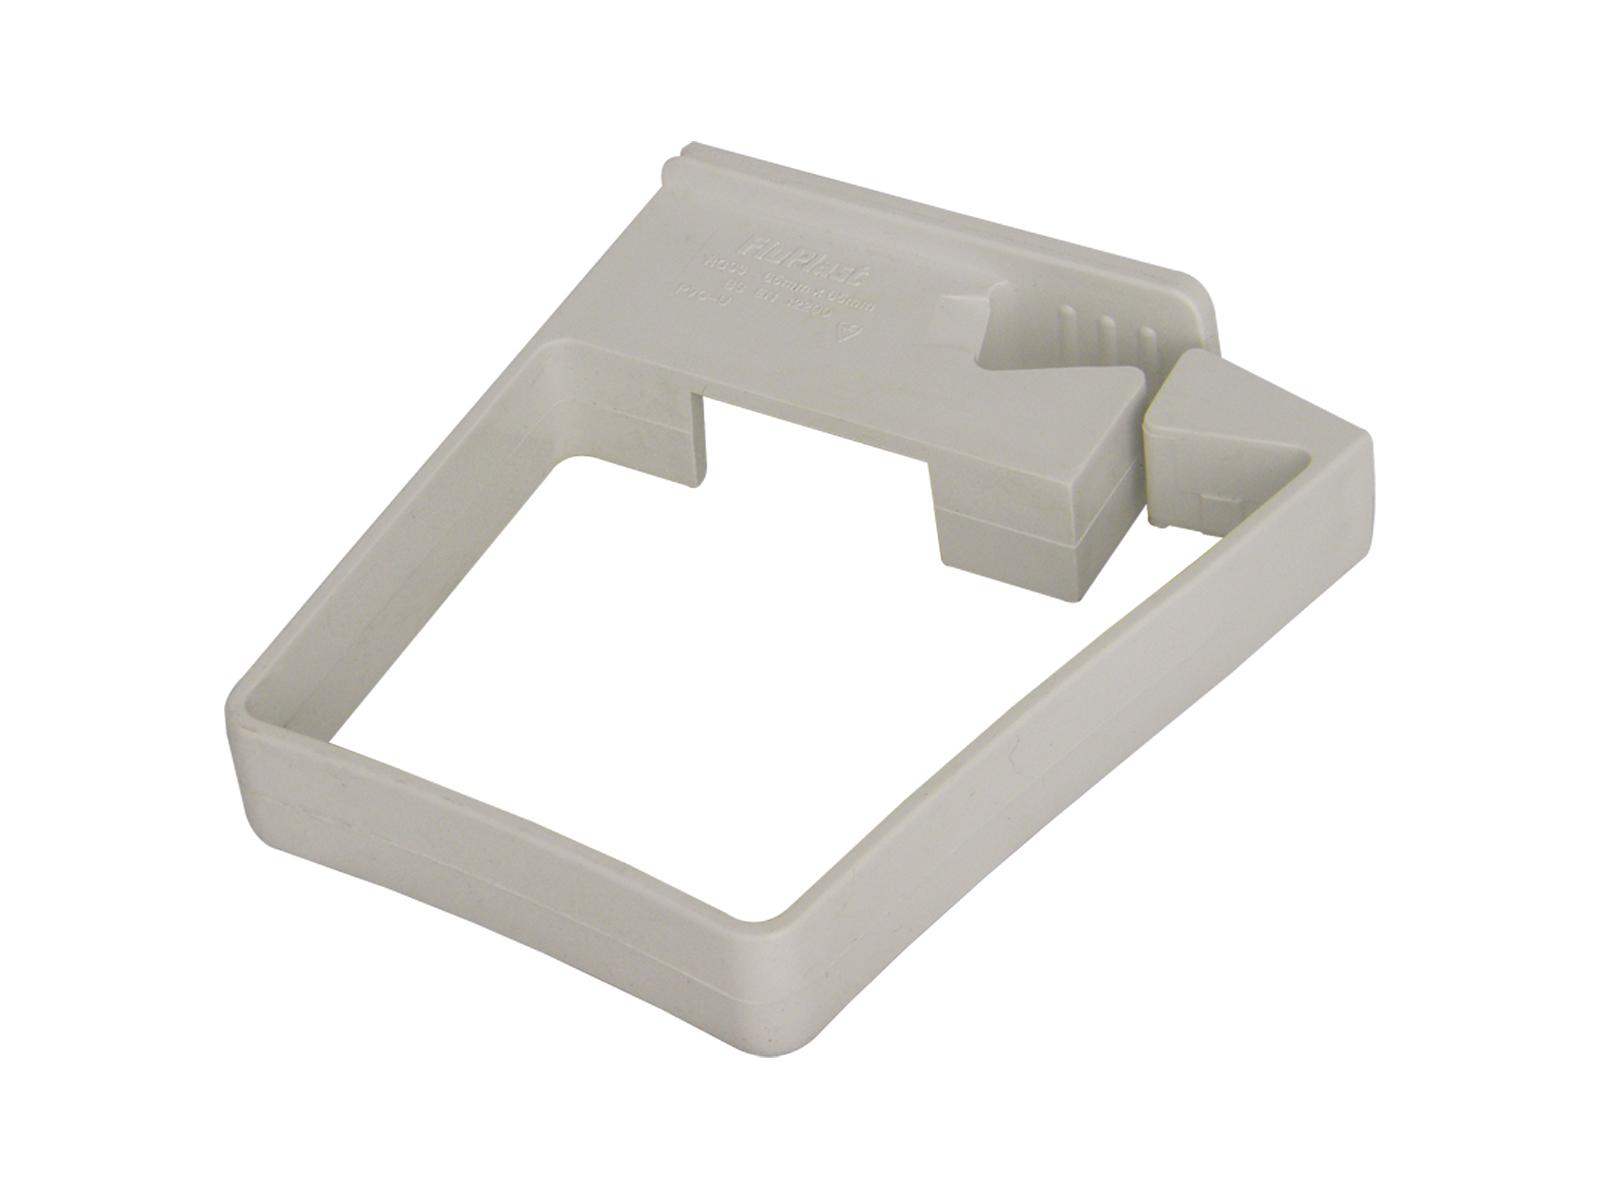 FLOPLAST 65MM SQUARE DOWNPIPE - RCS3 SINGLE FIX PIPE CLIP - WHITE